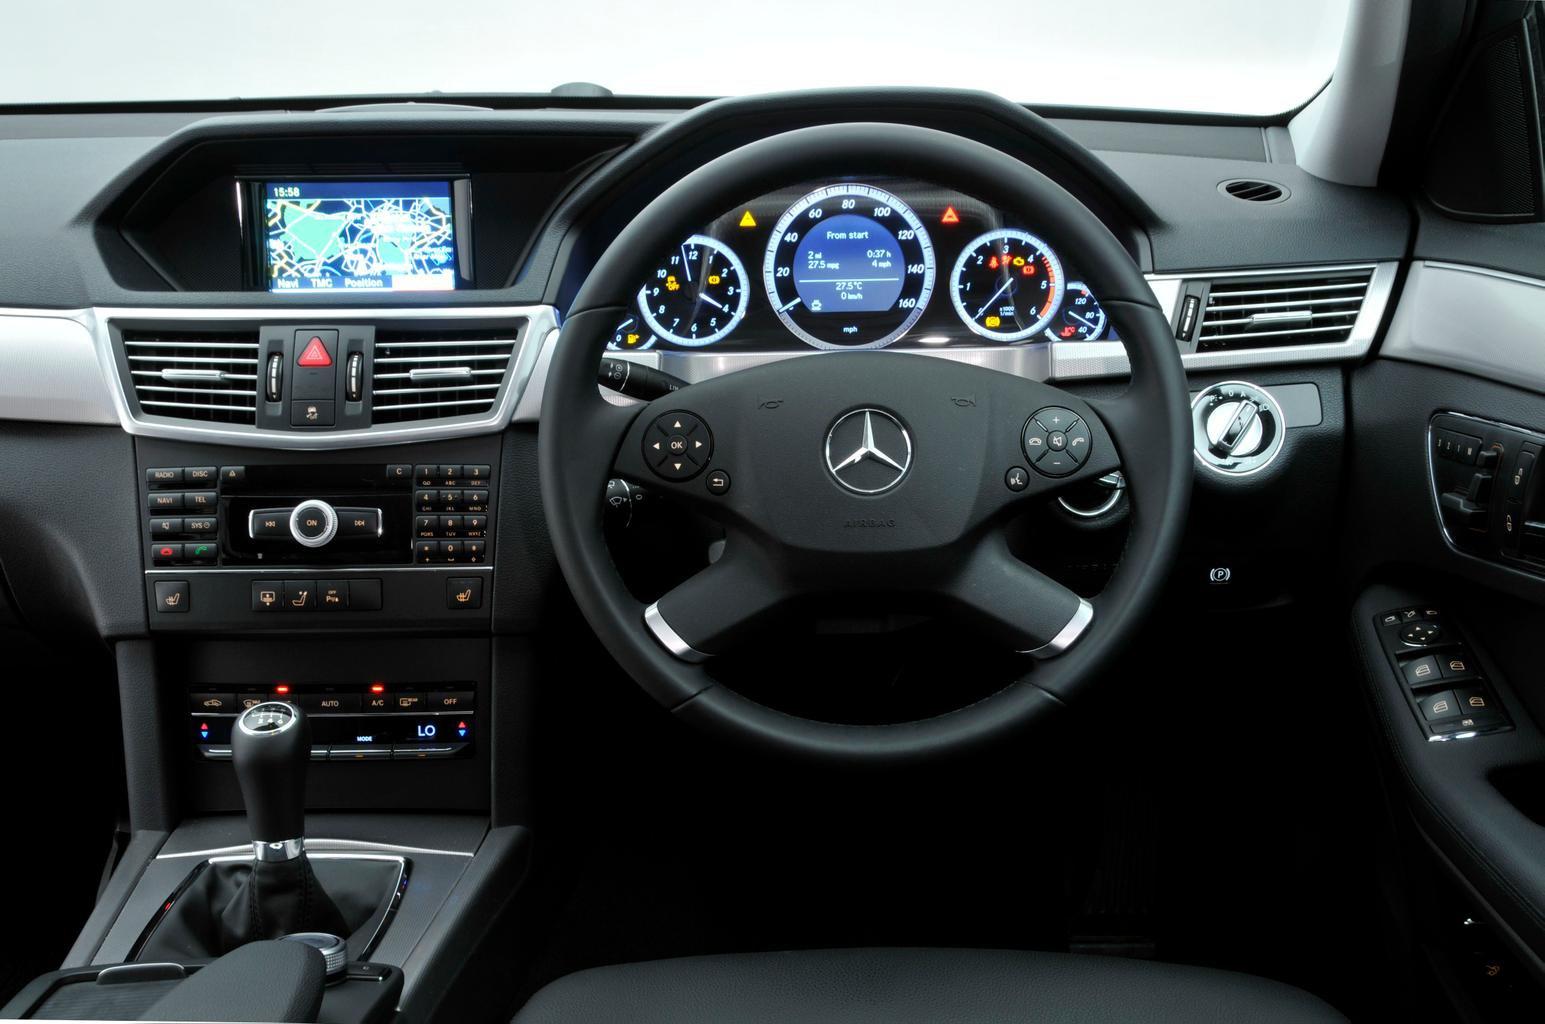 Mercedes-Benz E-Class Saloon (09 - 16)